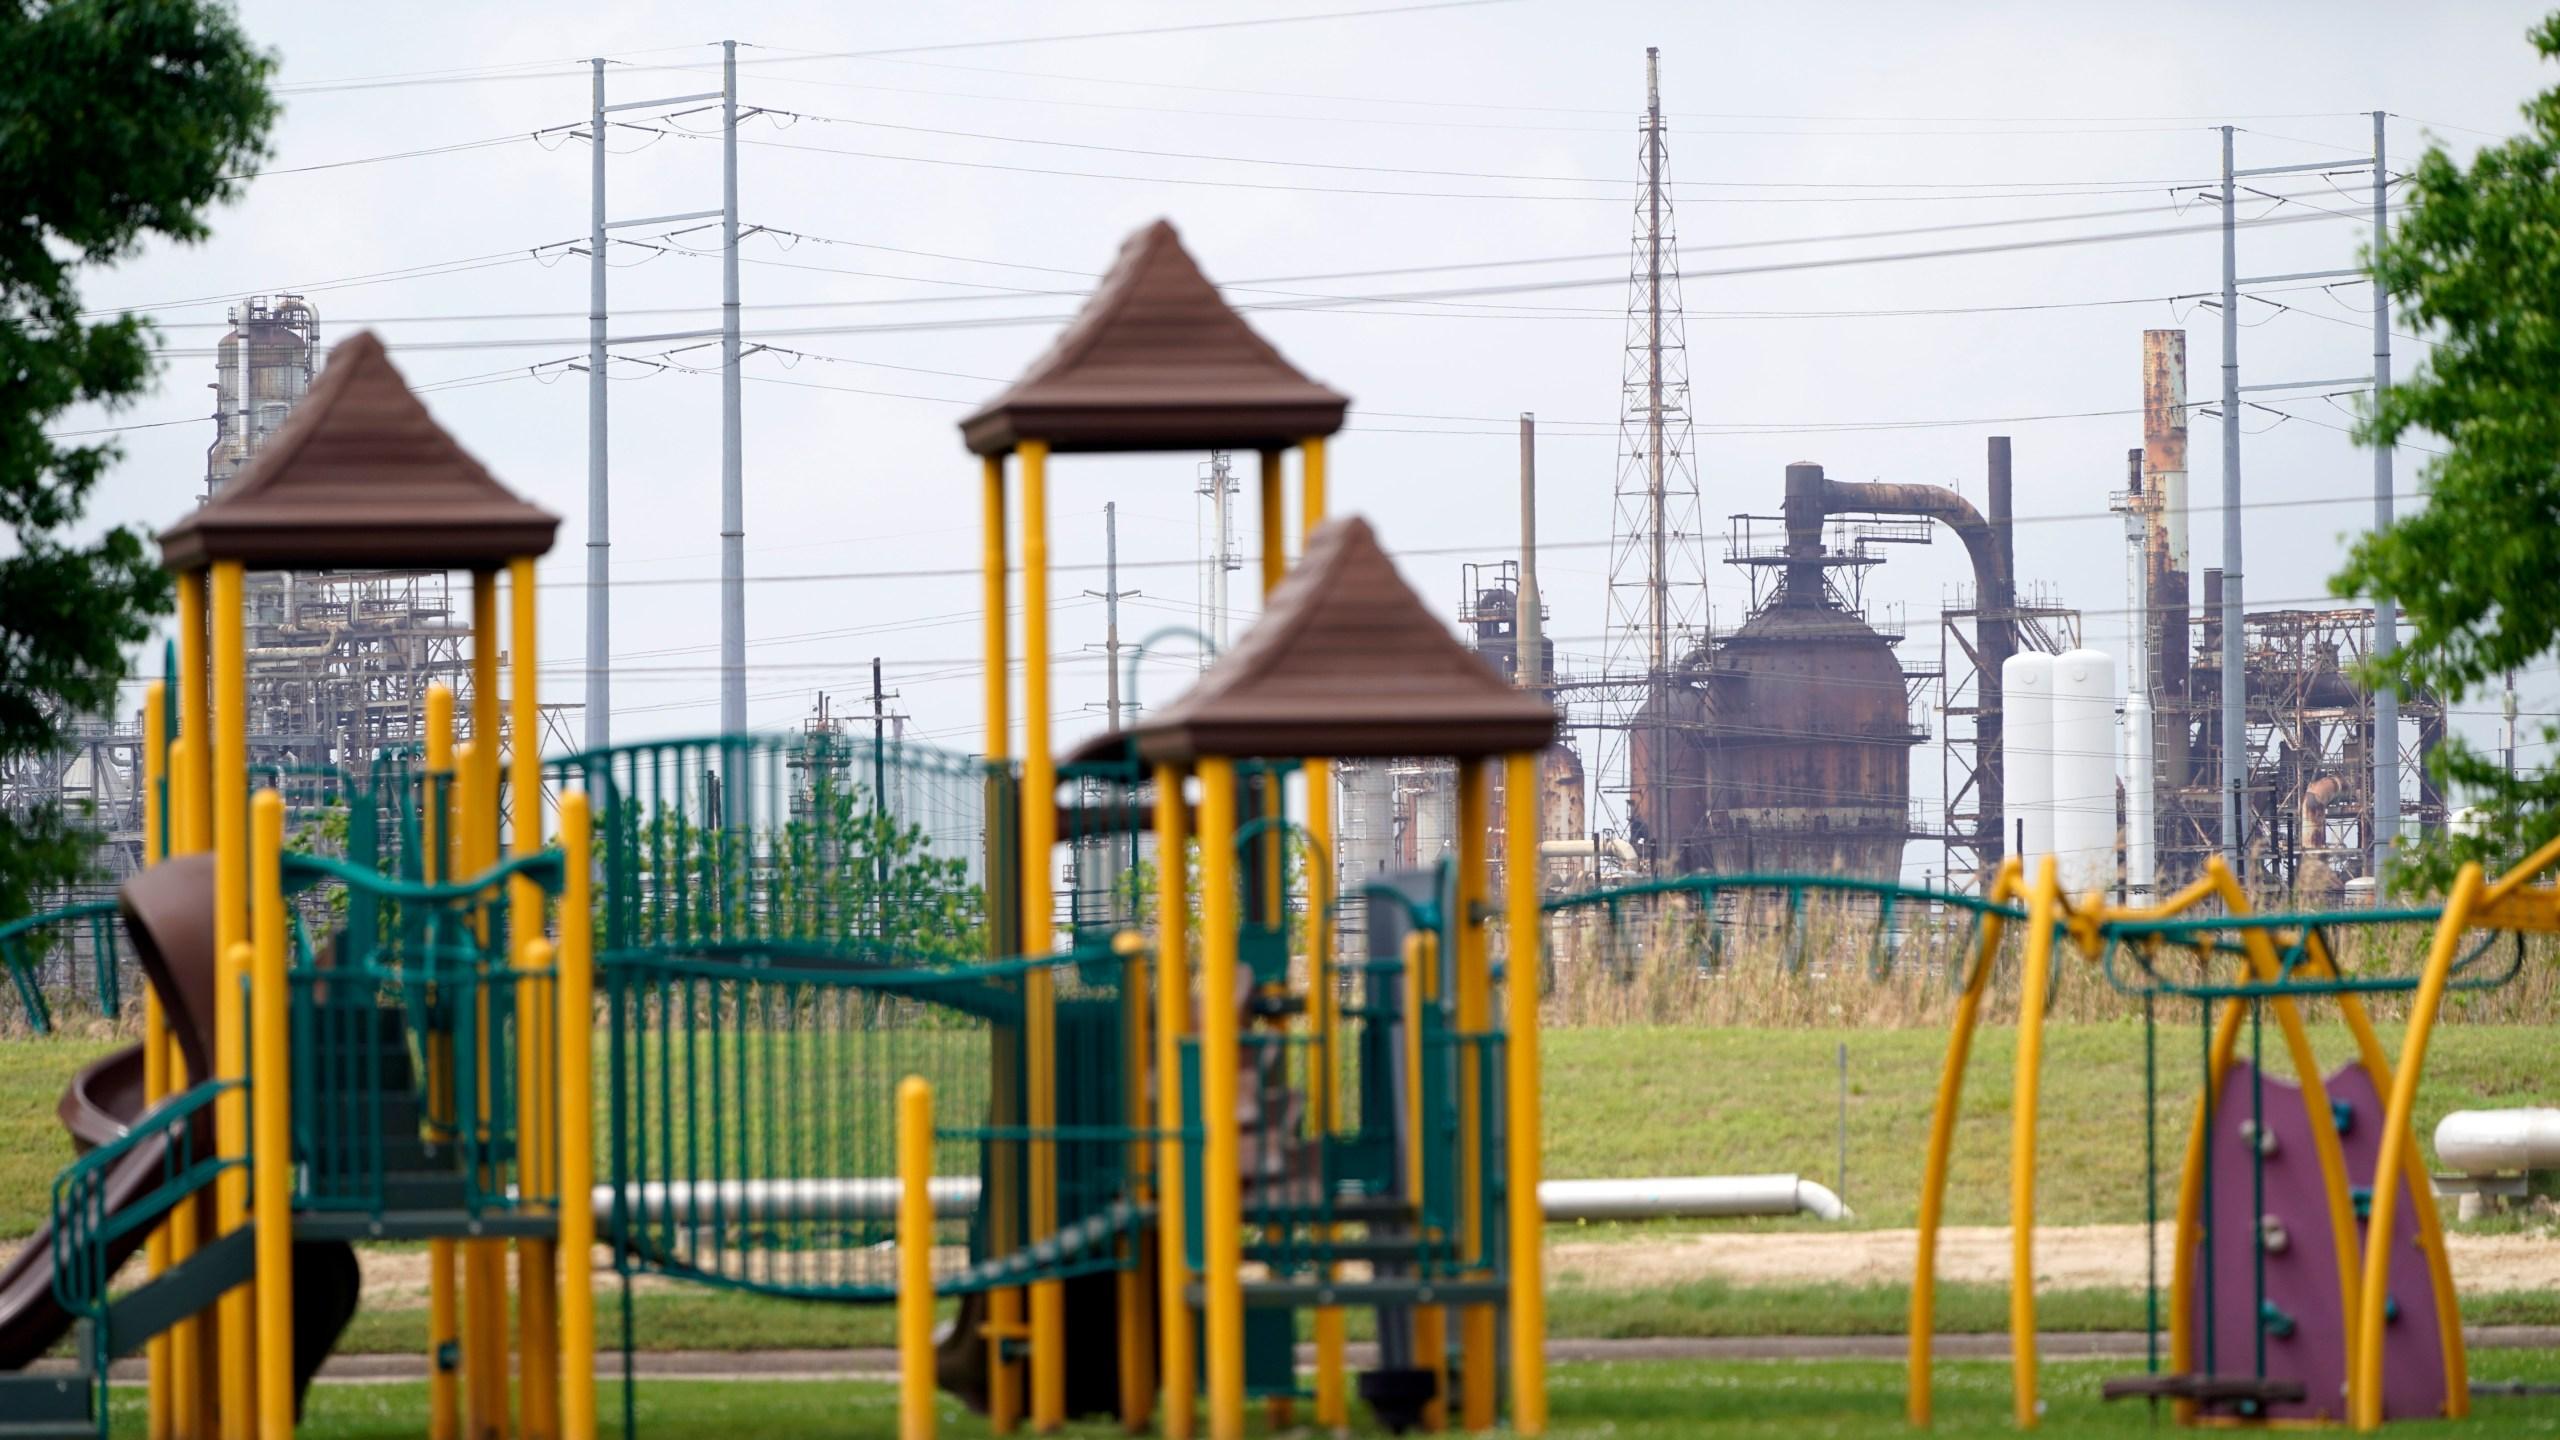 Playground, refinery